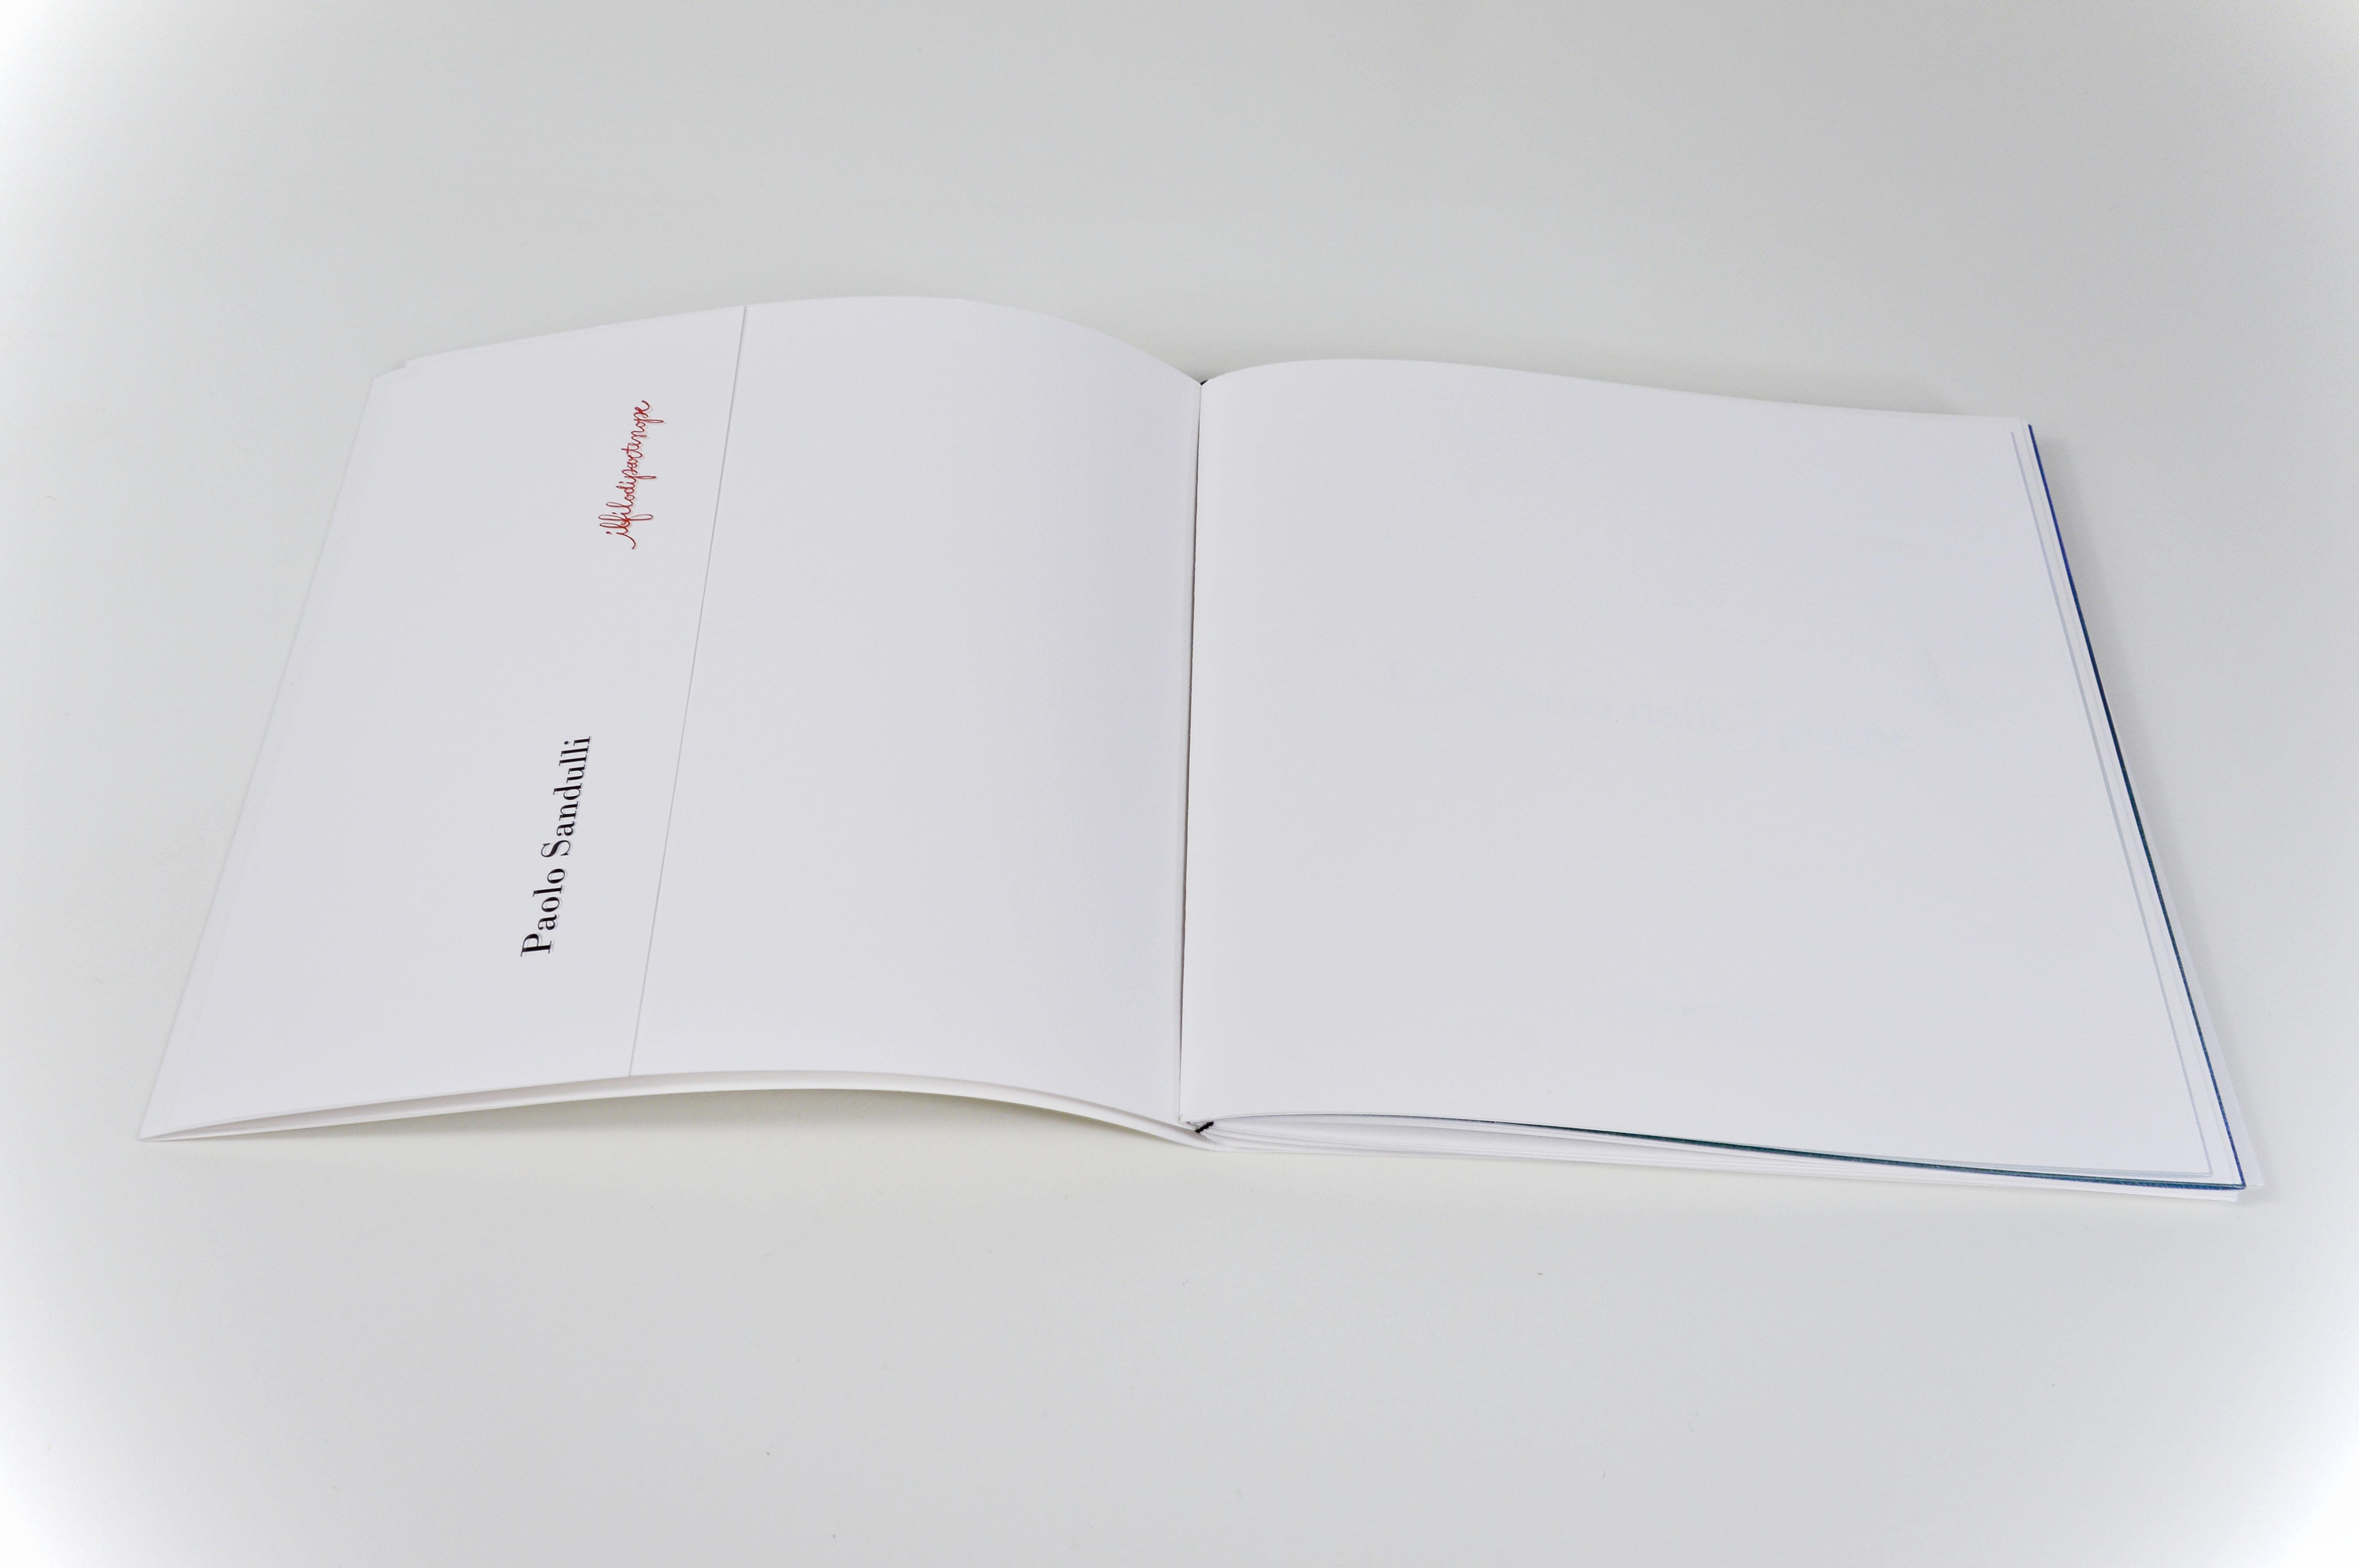 L'albero delle spugne - Sandulli / Vargas / Benestante